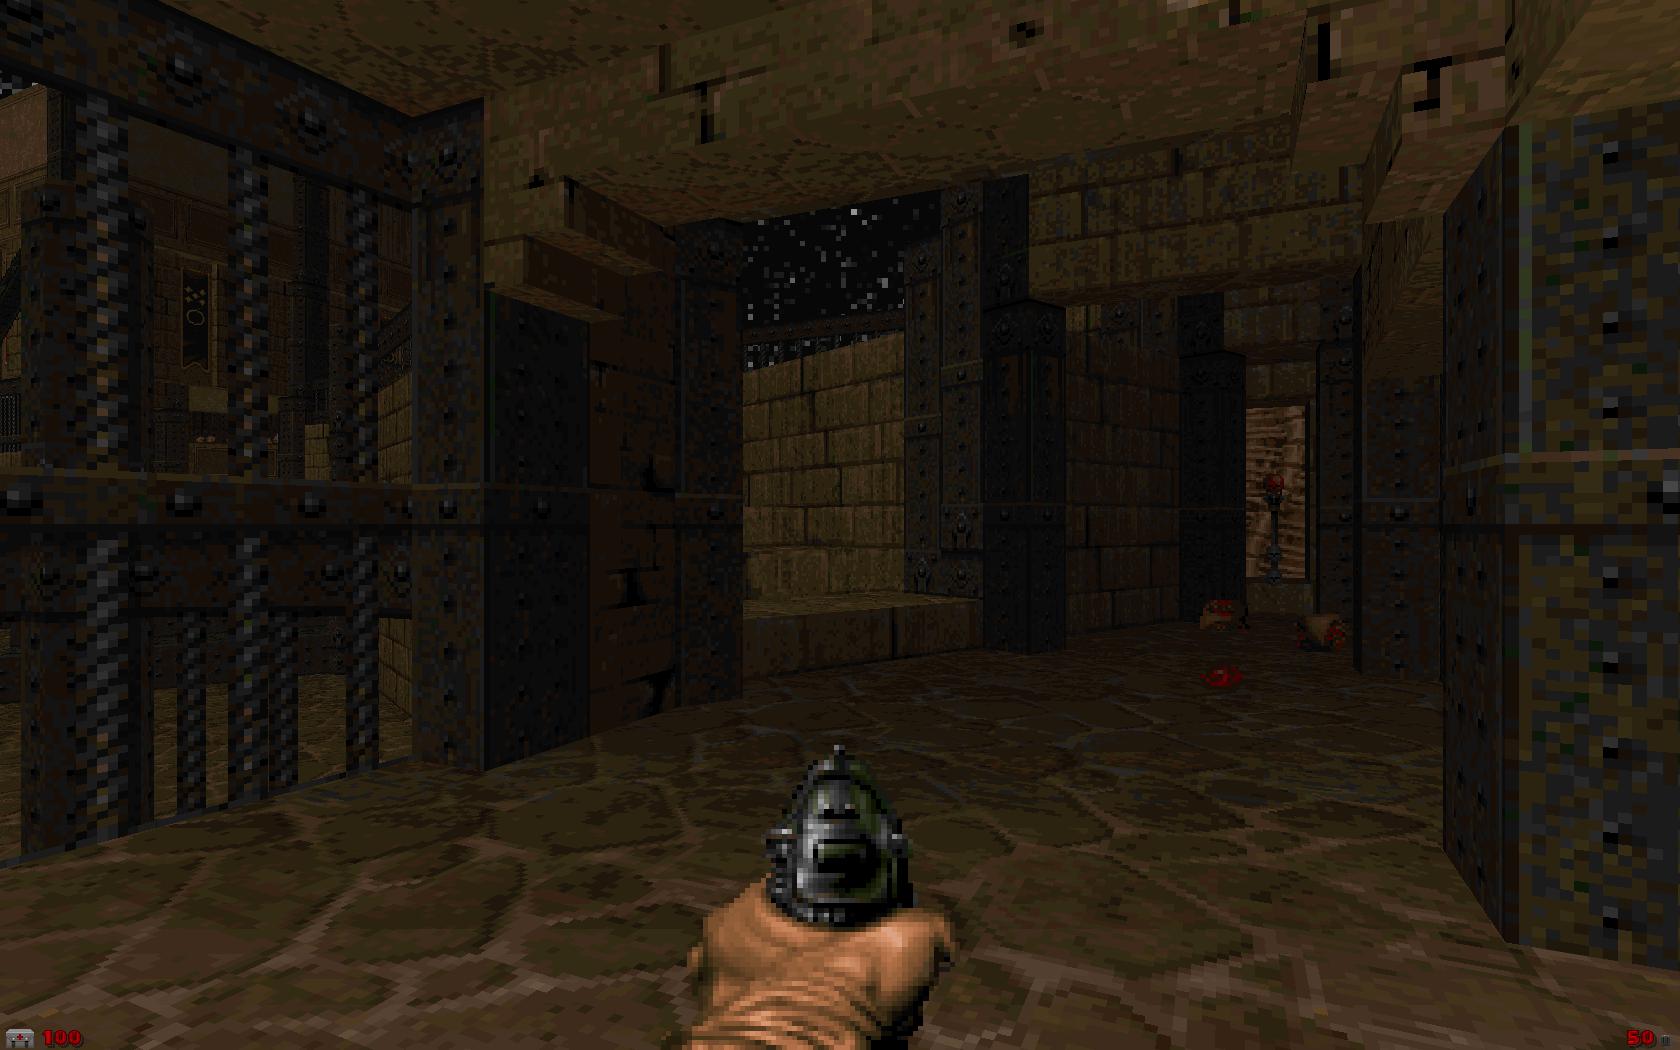 Screenshot_Doom_20200802_192312.png.74668fa2d7c99df6ac707cdb4a1b8ffb.png